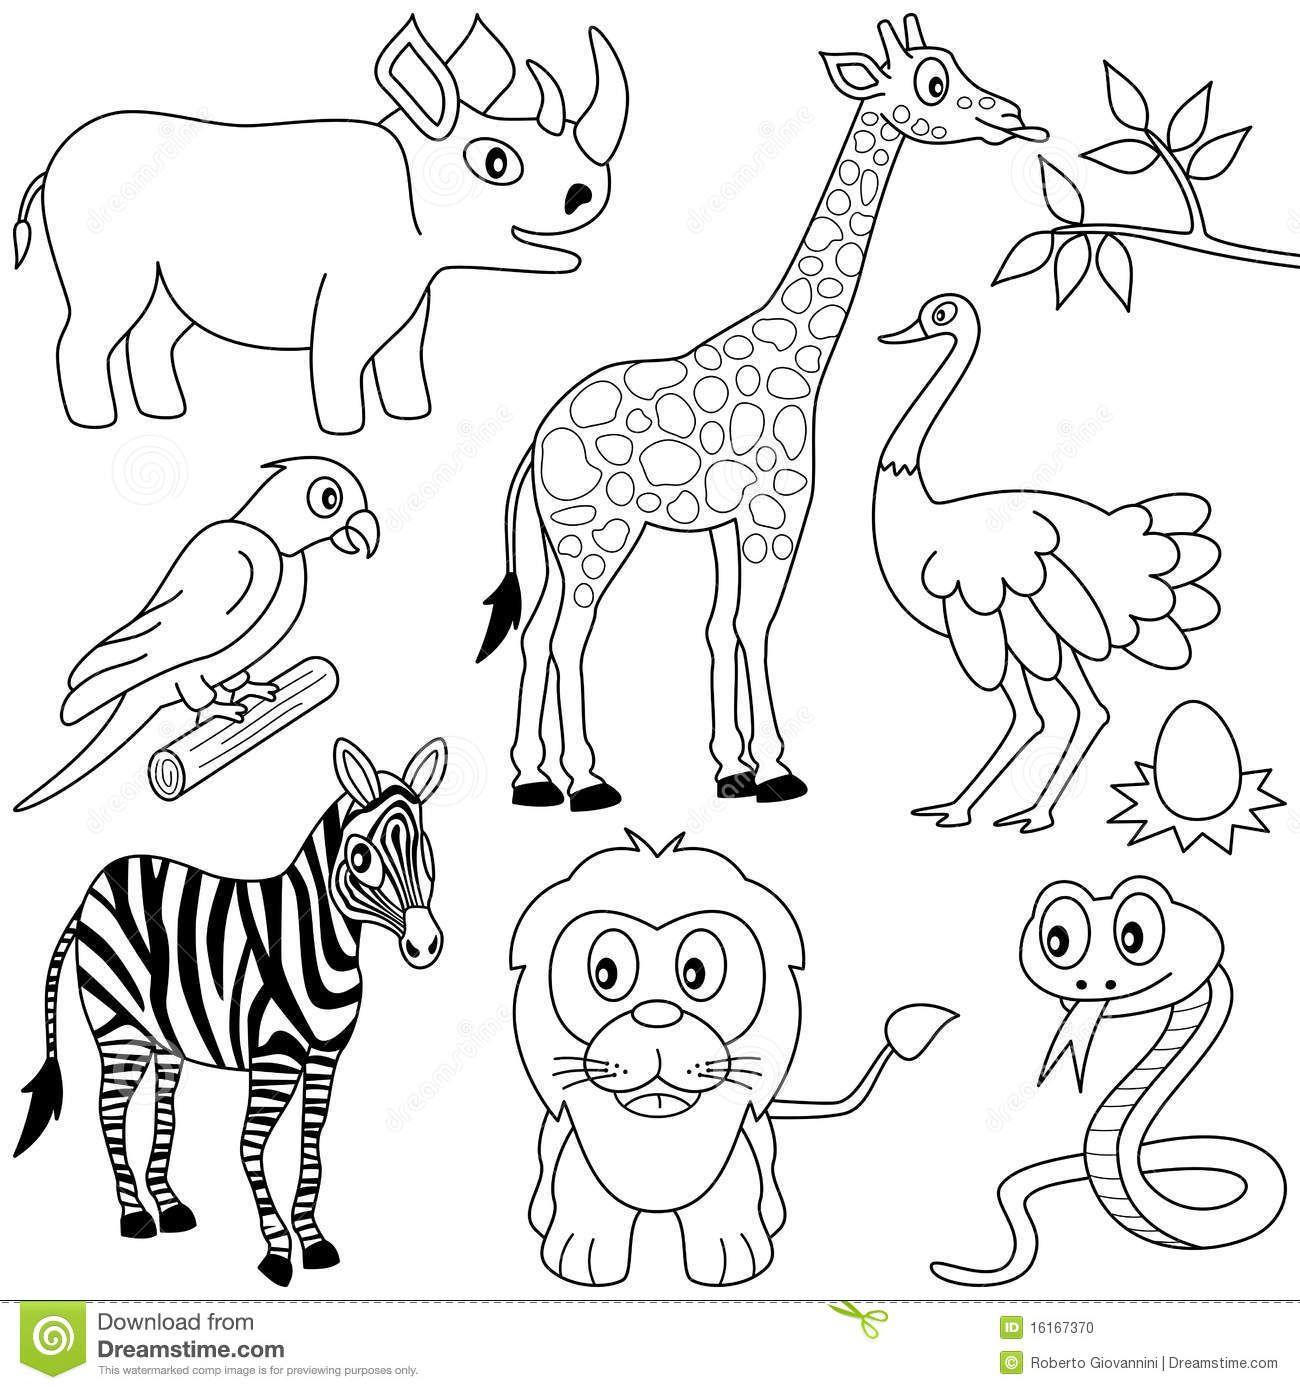 pigeon kresba - - Yahoo Image Search Results | Kresba-animals ...